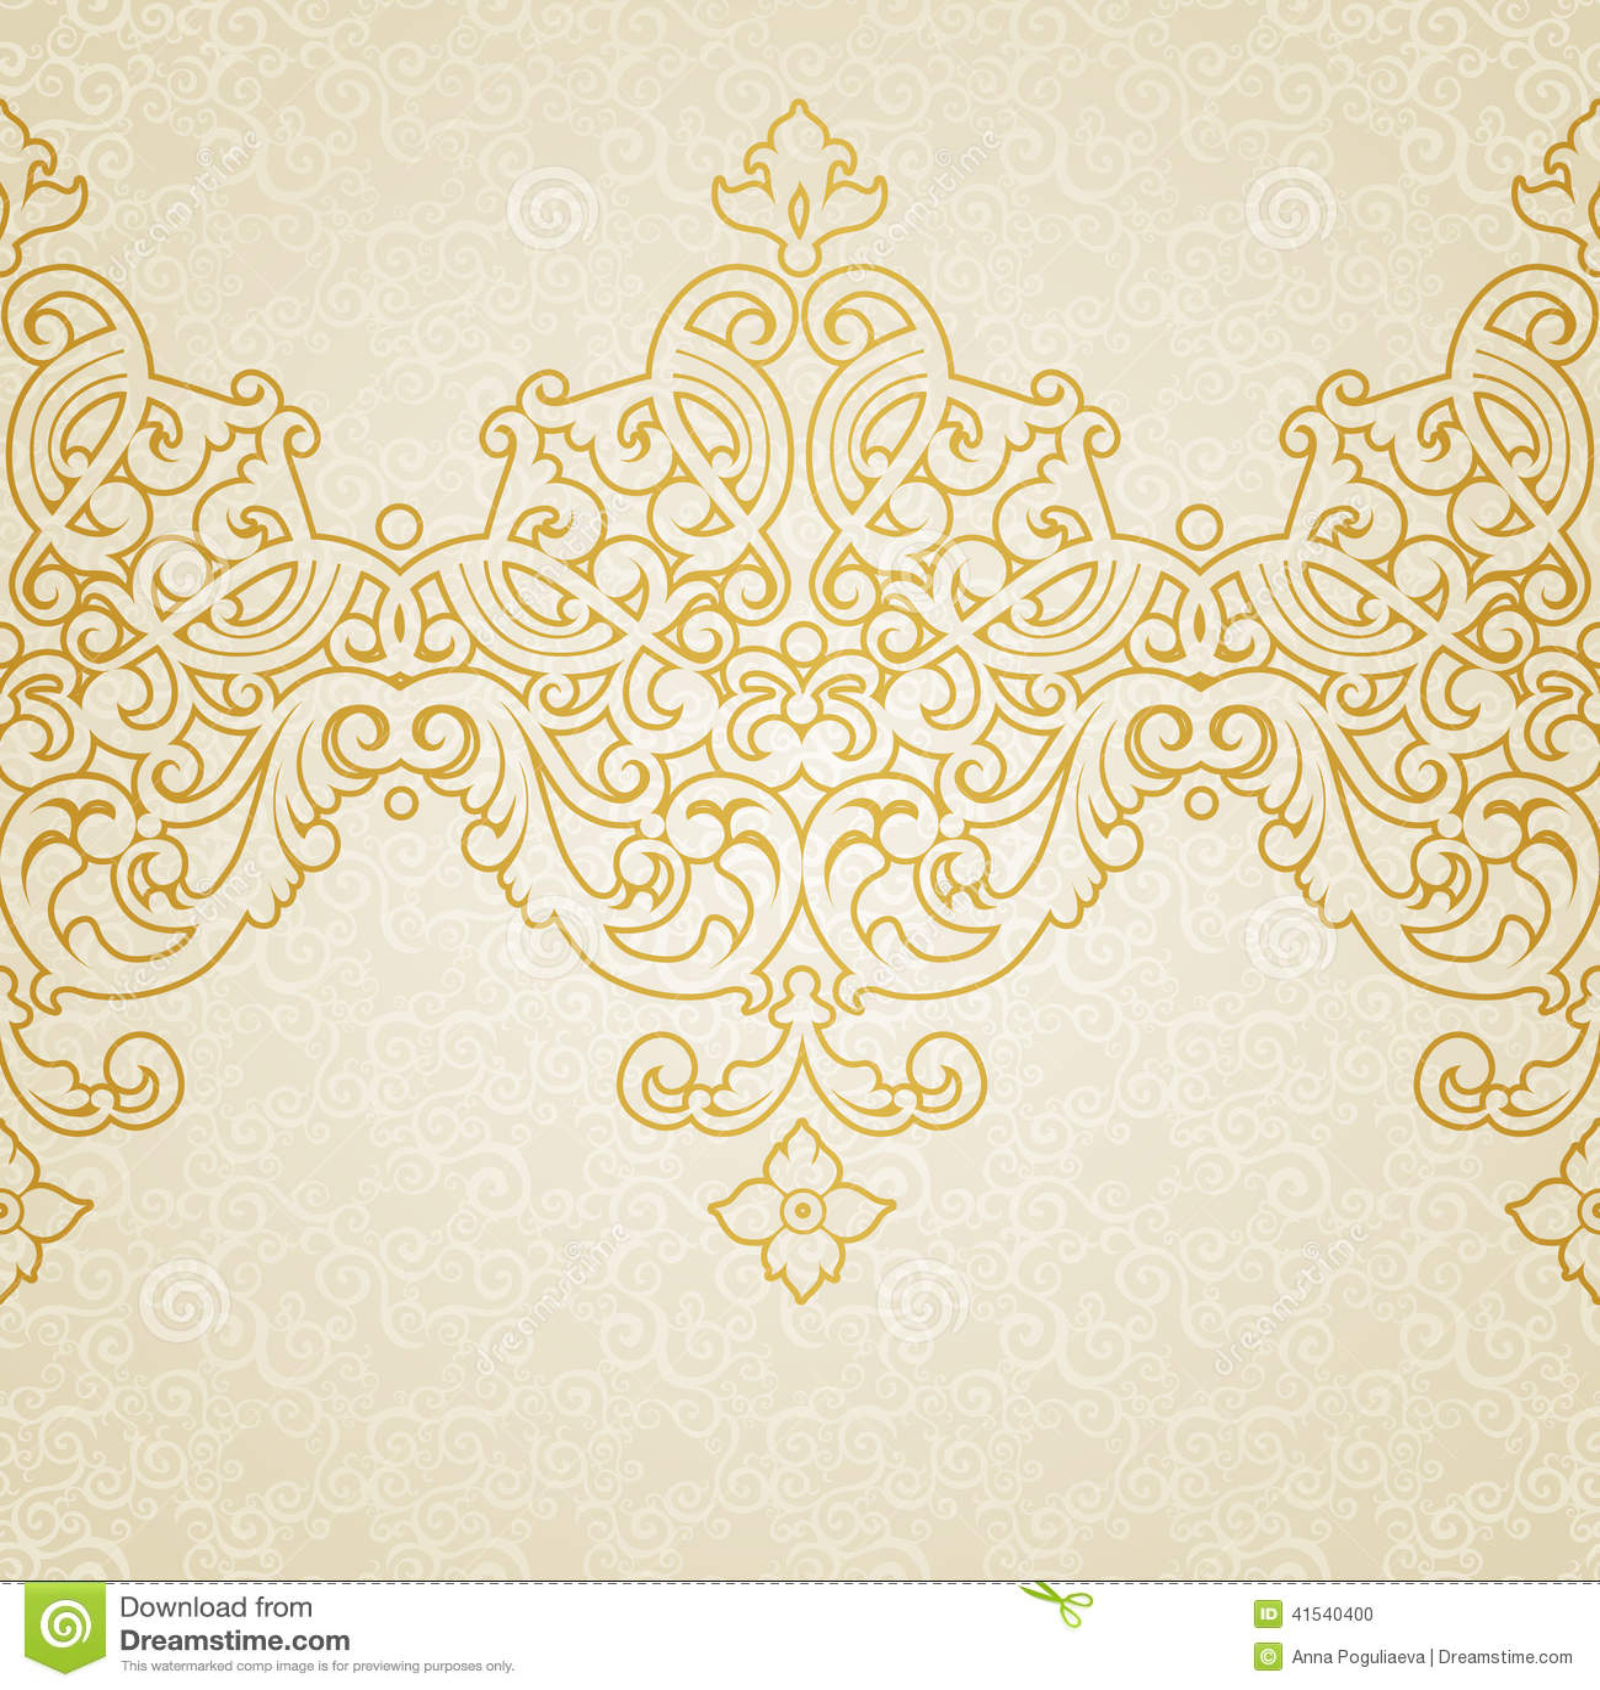 Wedding Invitations Prices is luxury invitation example